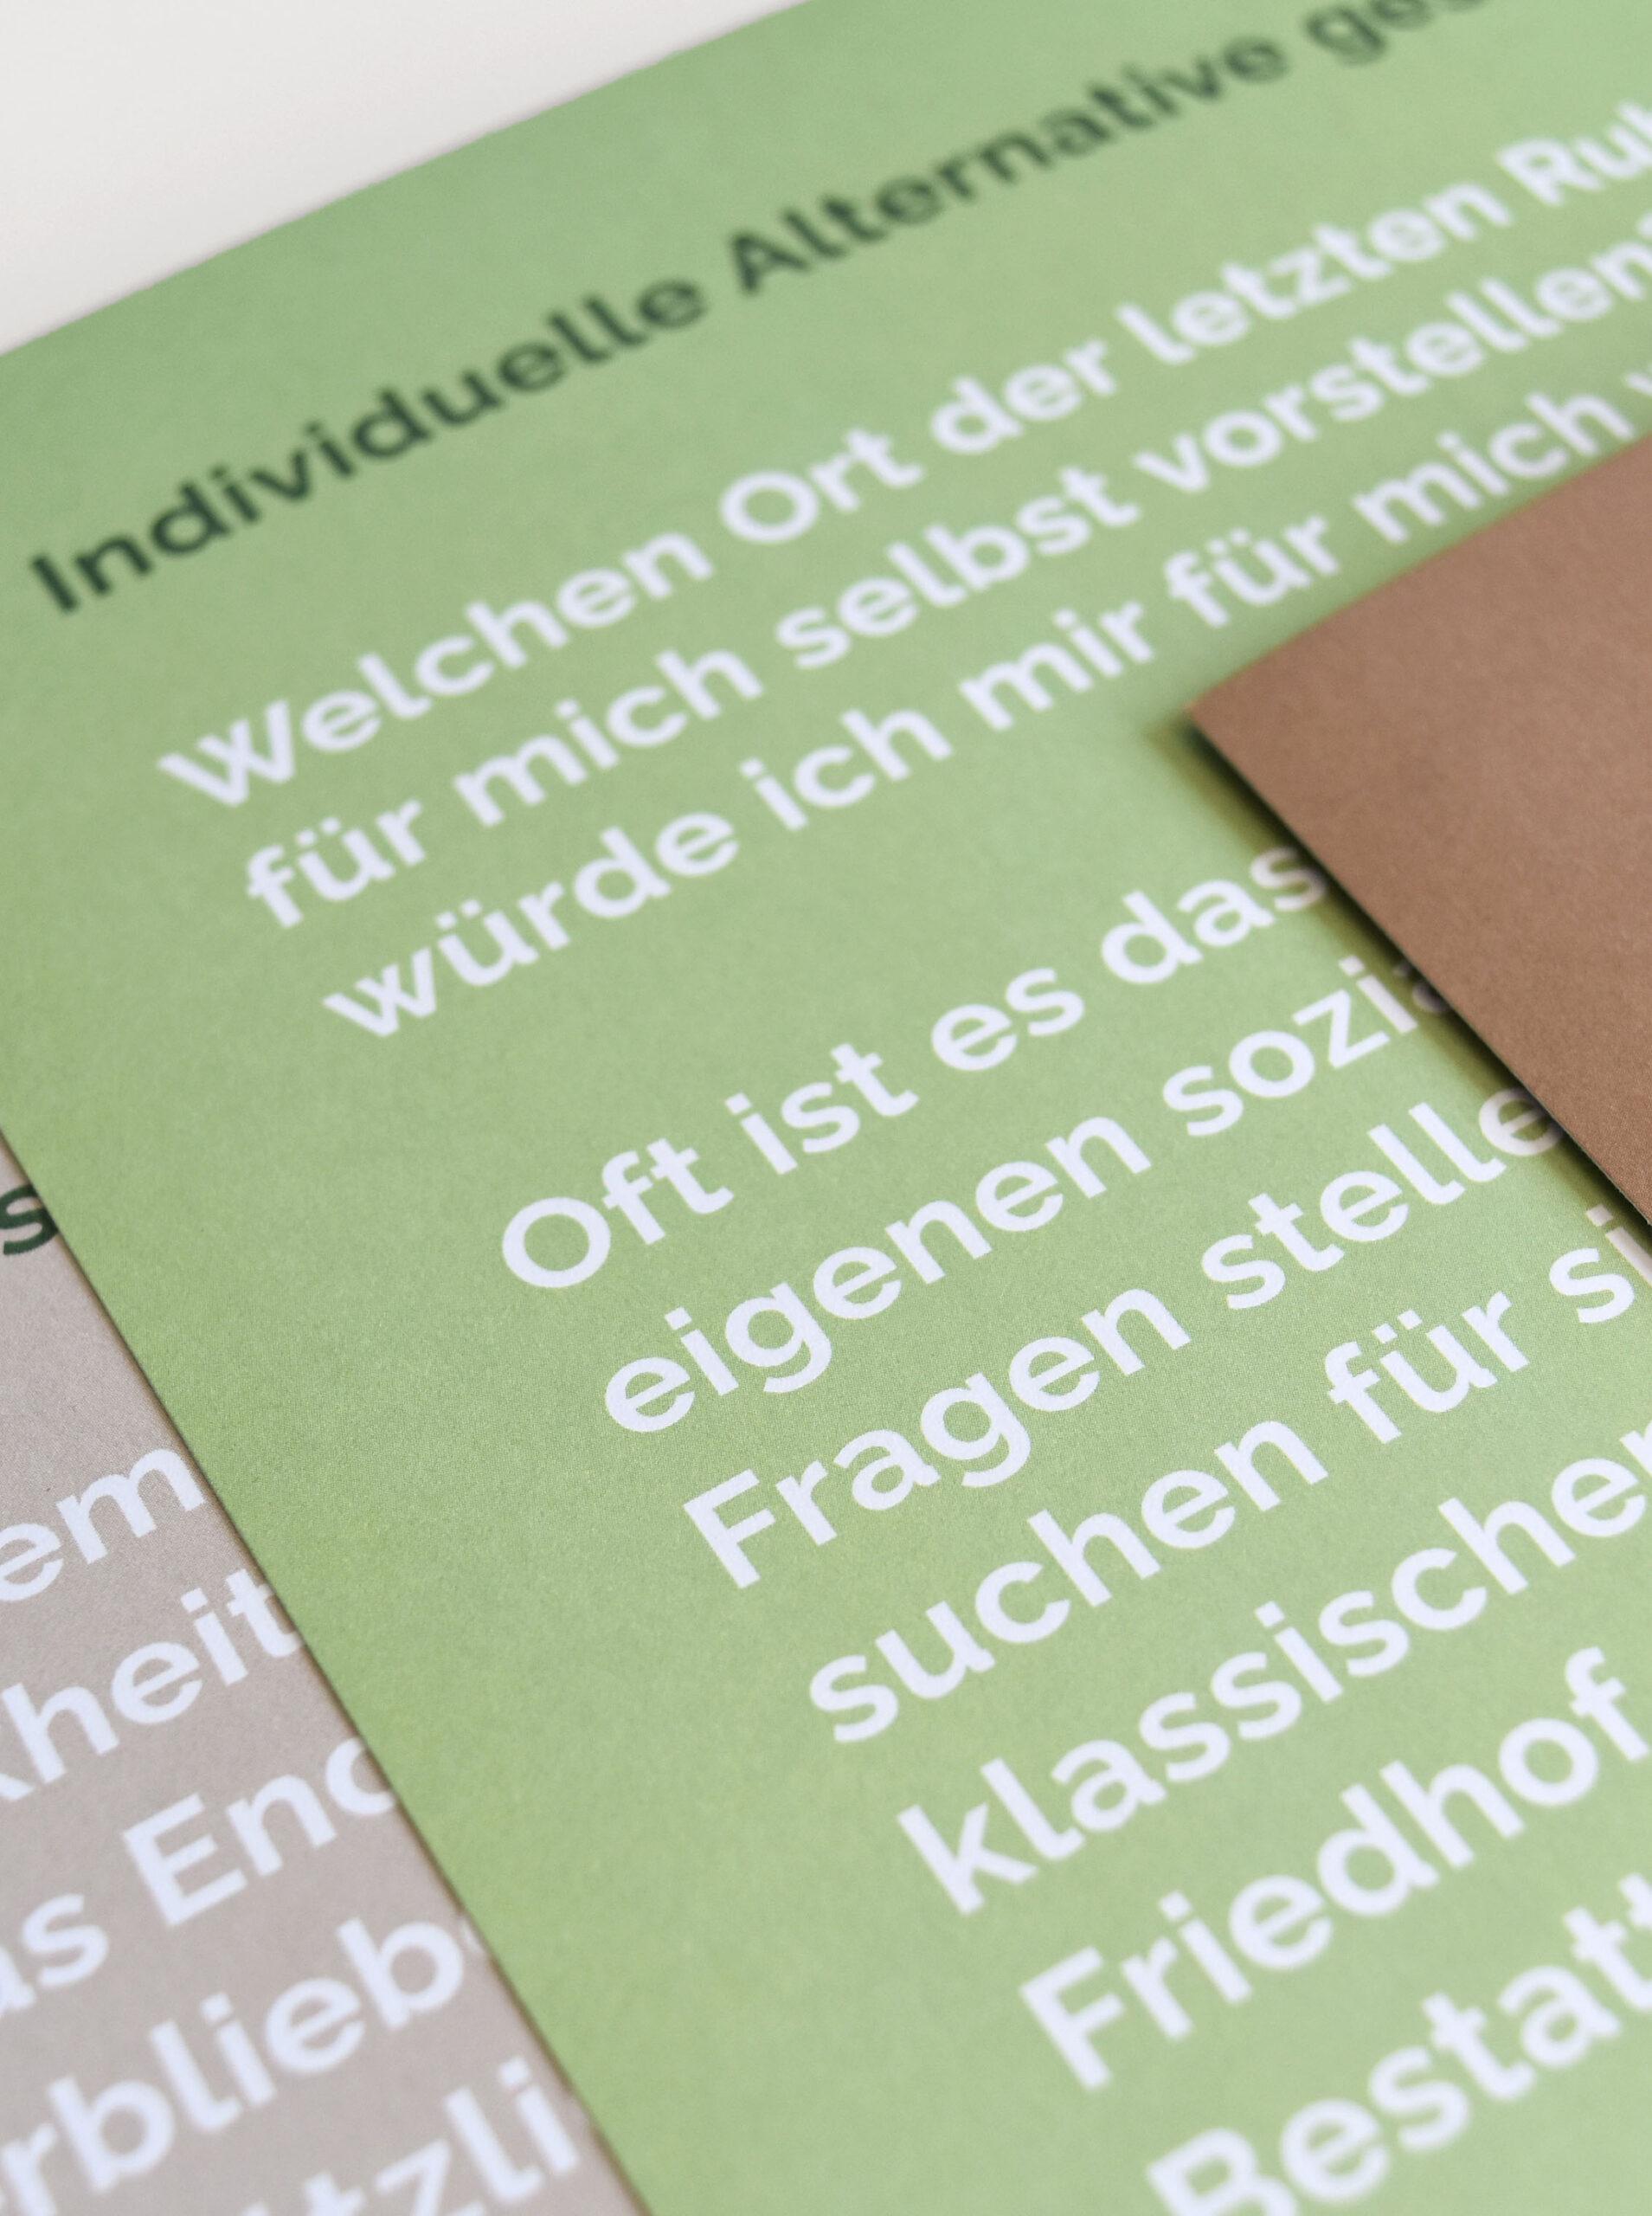 Case-Study-FriedWald-Material_Broschueren-Trio-02-1